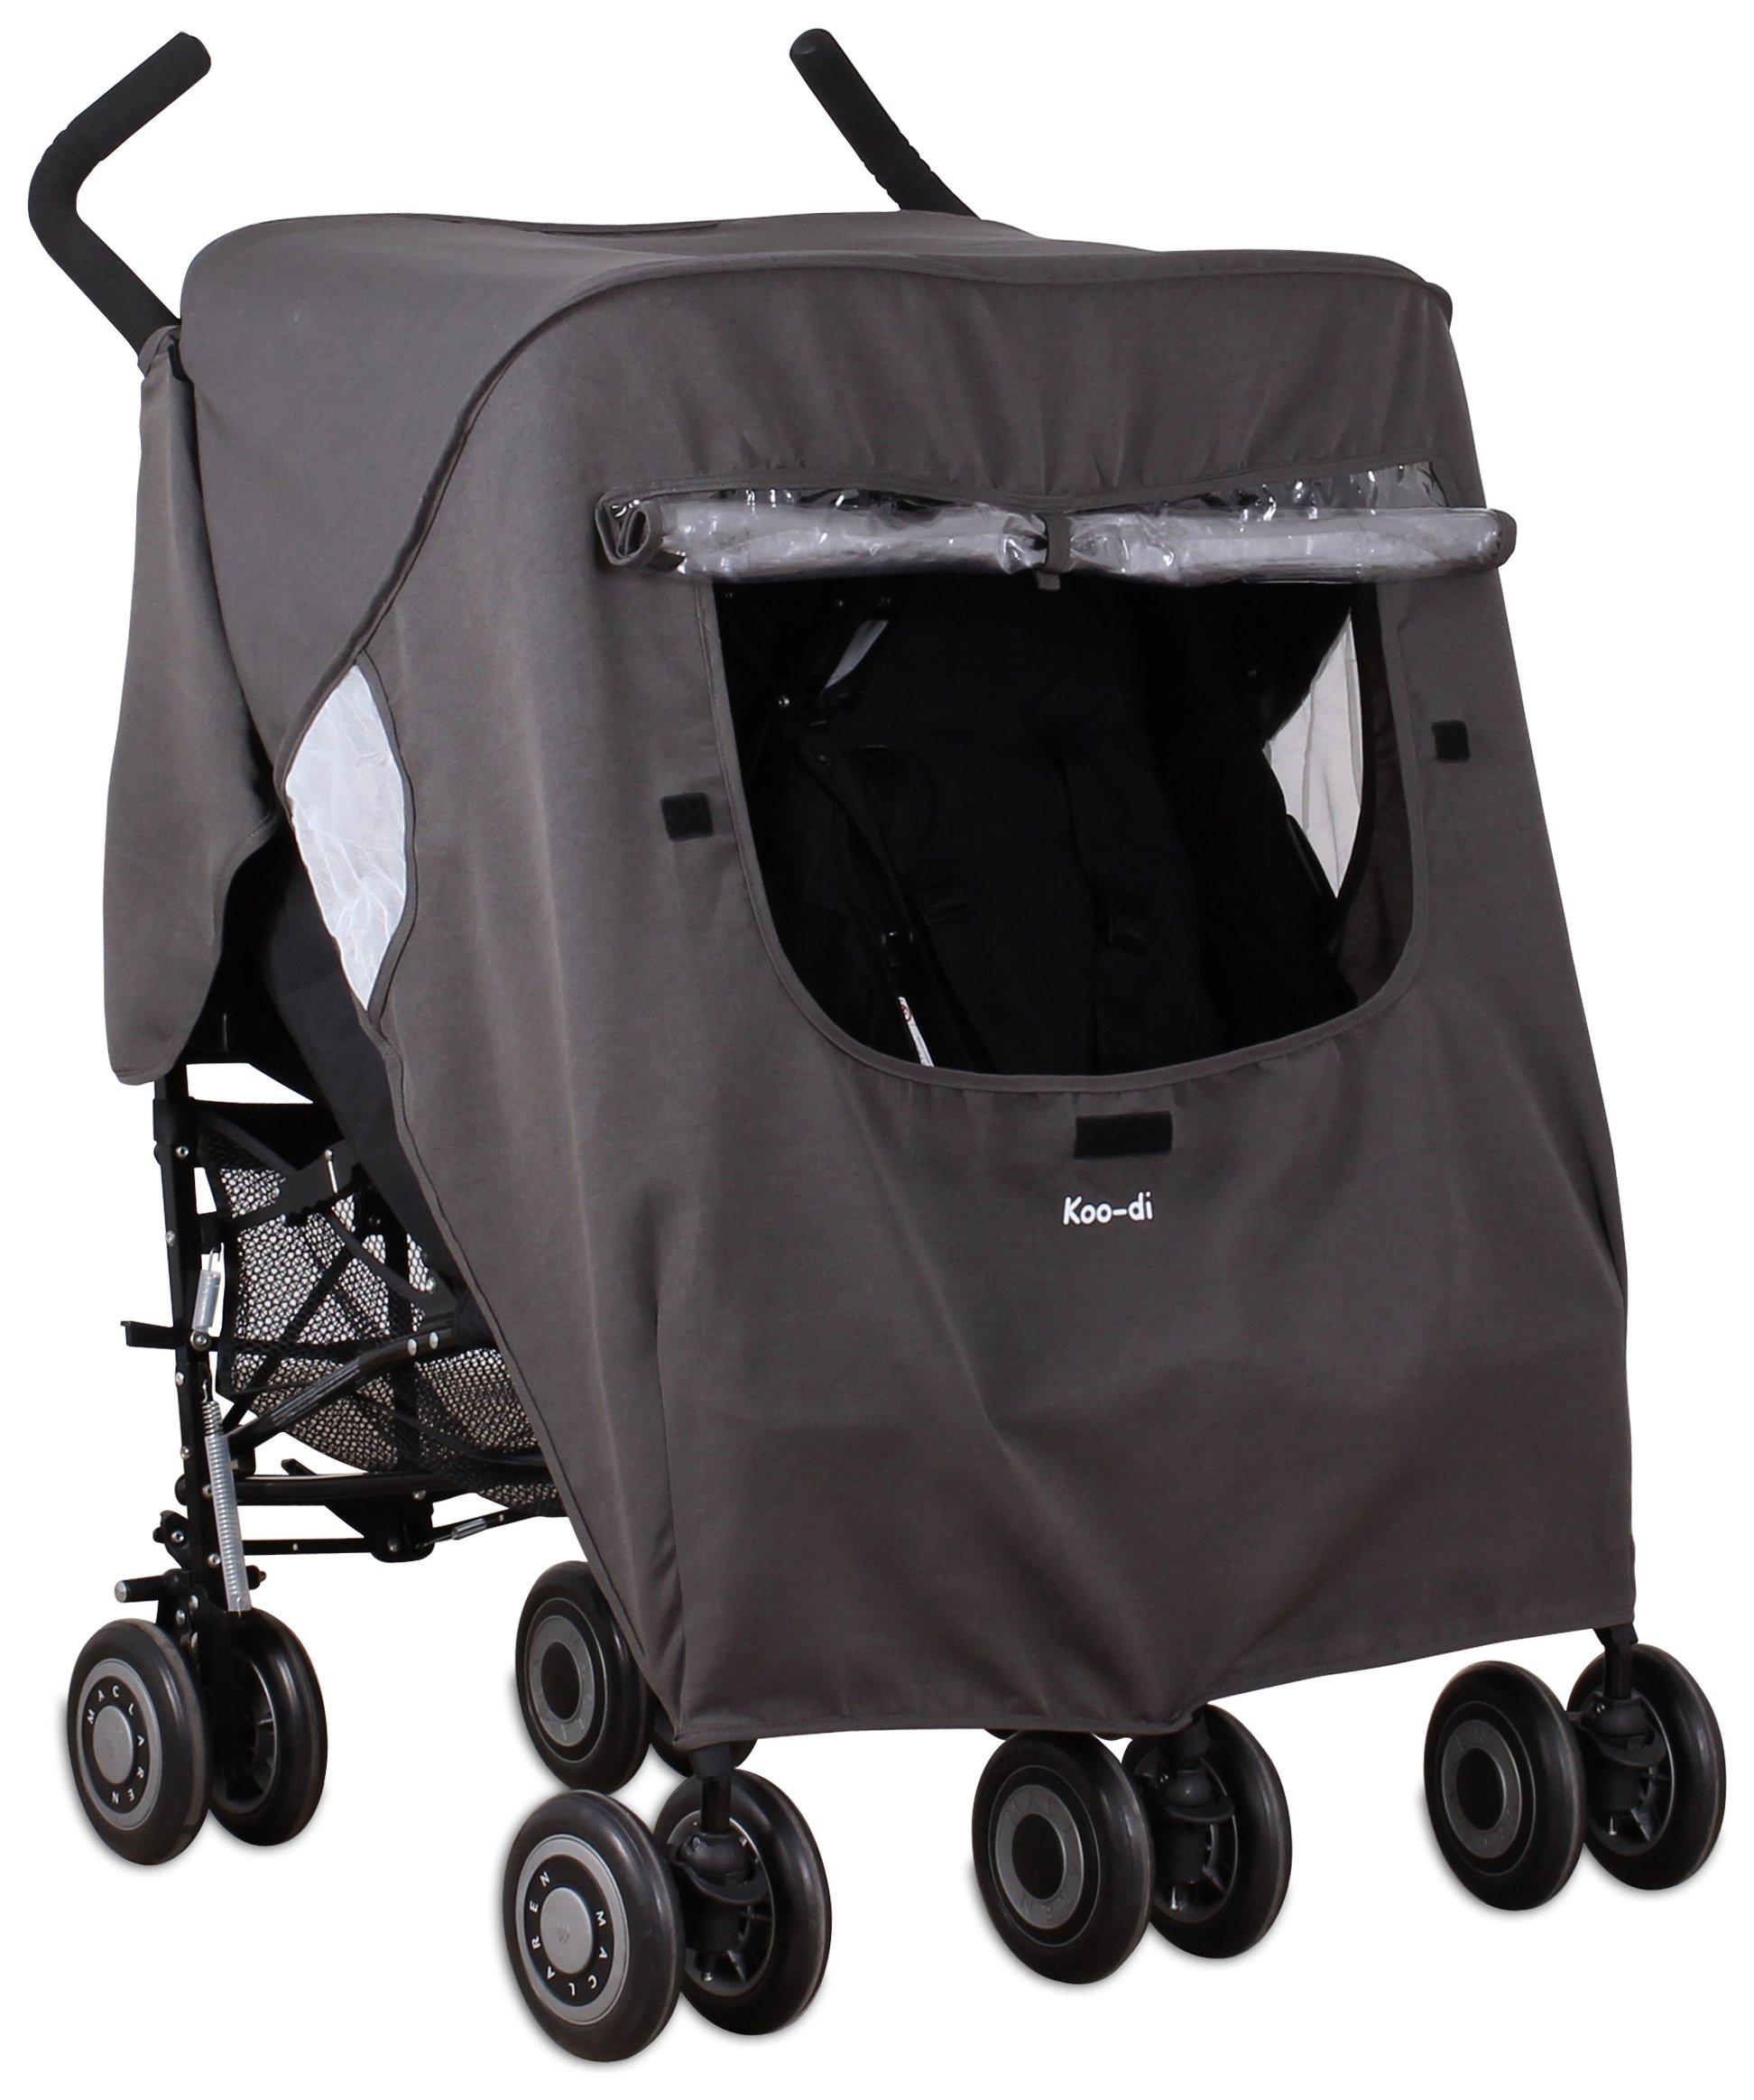 Koo-di Pack-It Double Stroller Rain Cover.